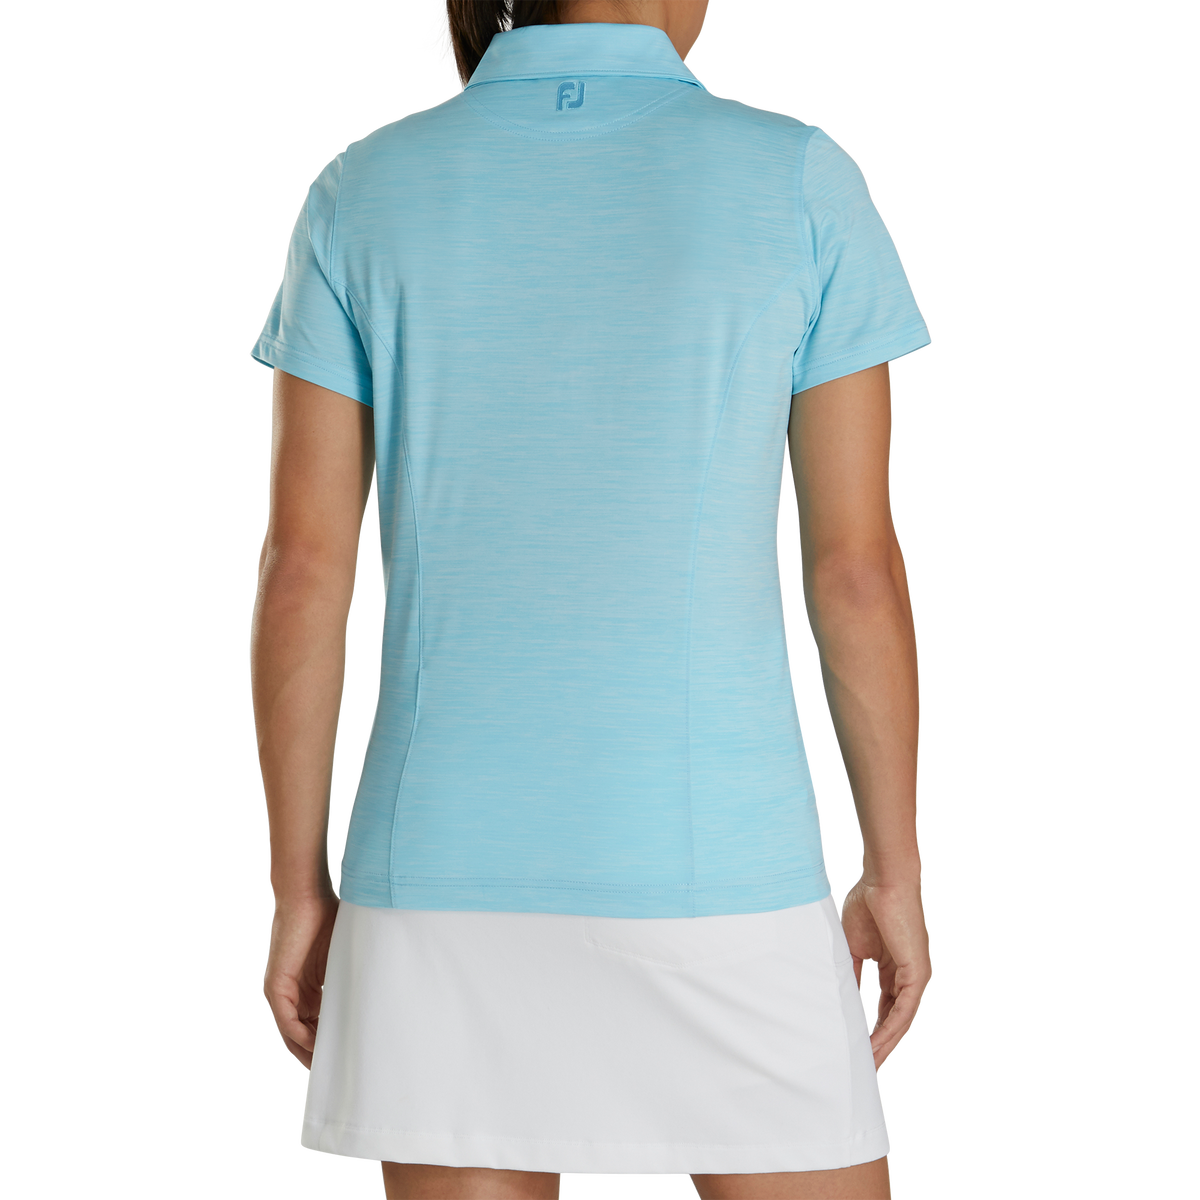 2020 U.S. Open ProDry Interlock Shirt Self Collar Women